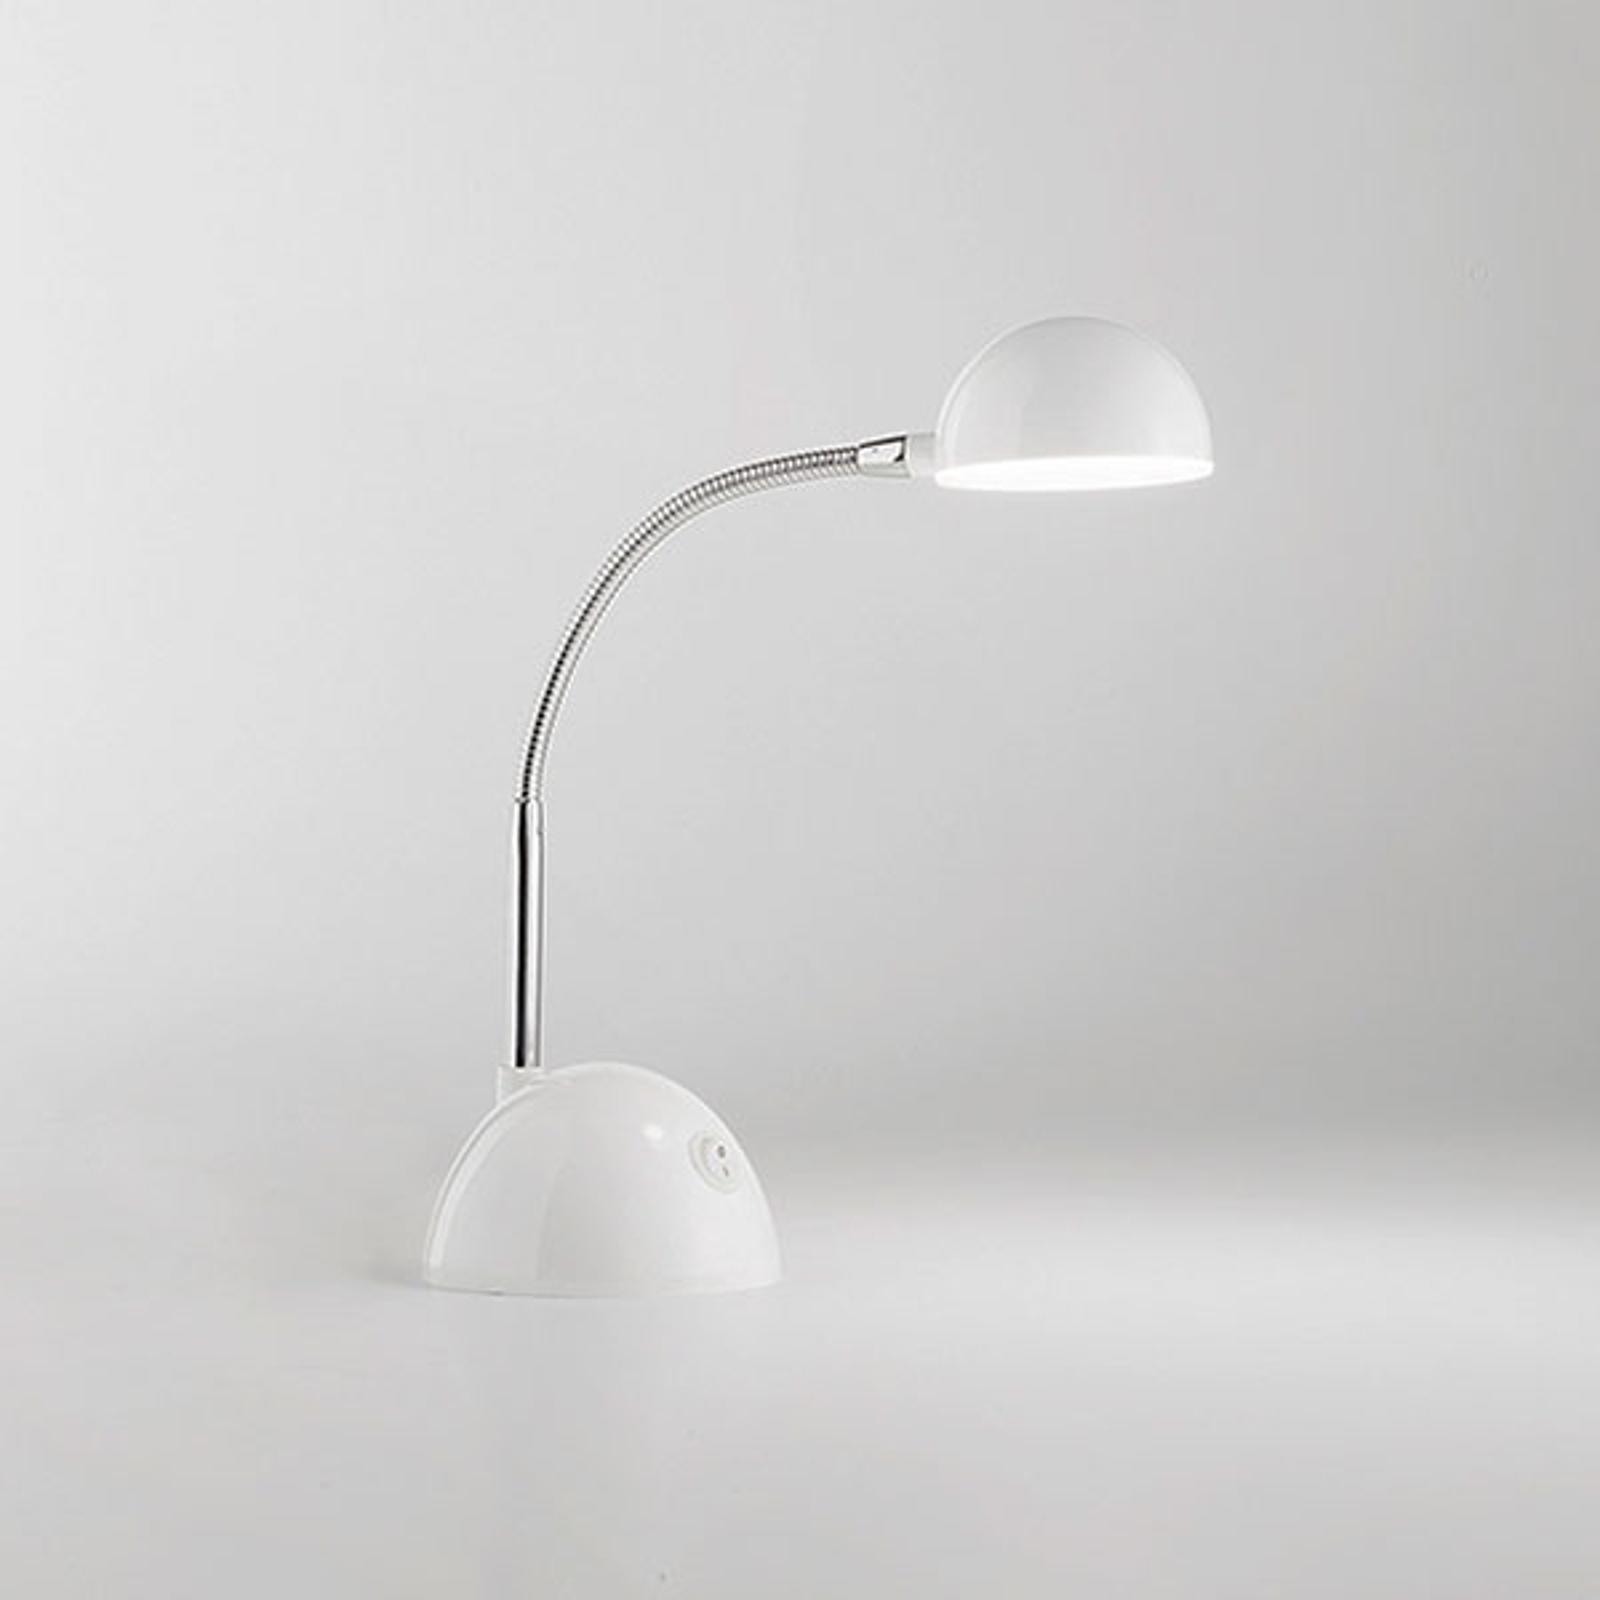 LED tafellamp 6512 met flexibele arm, wit